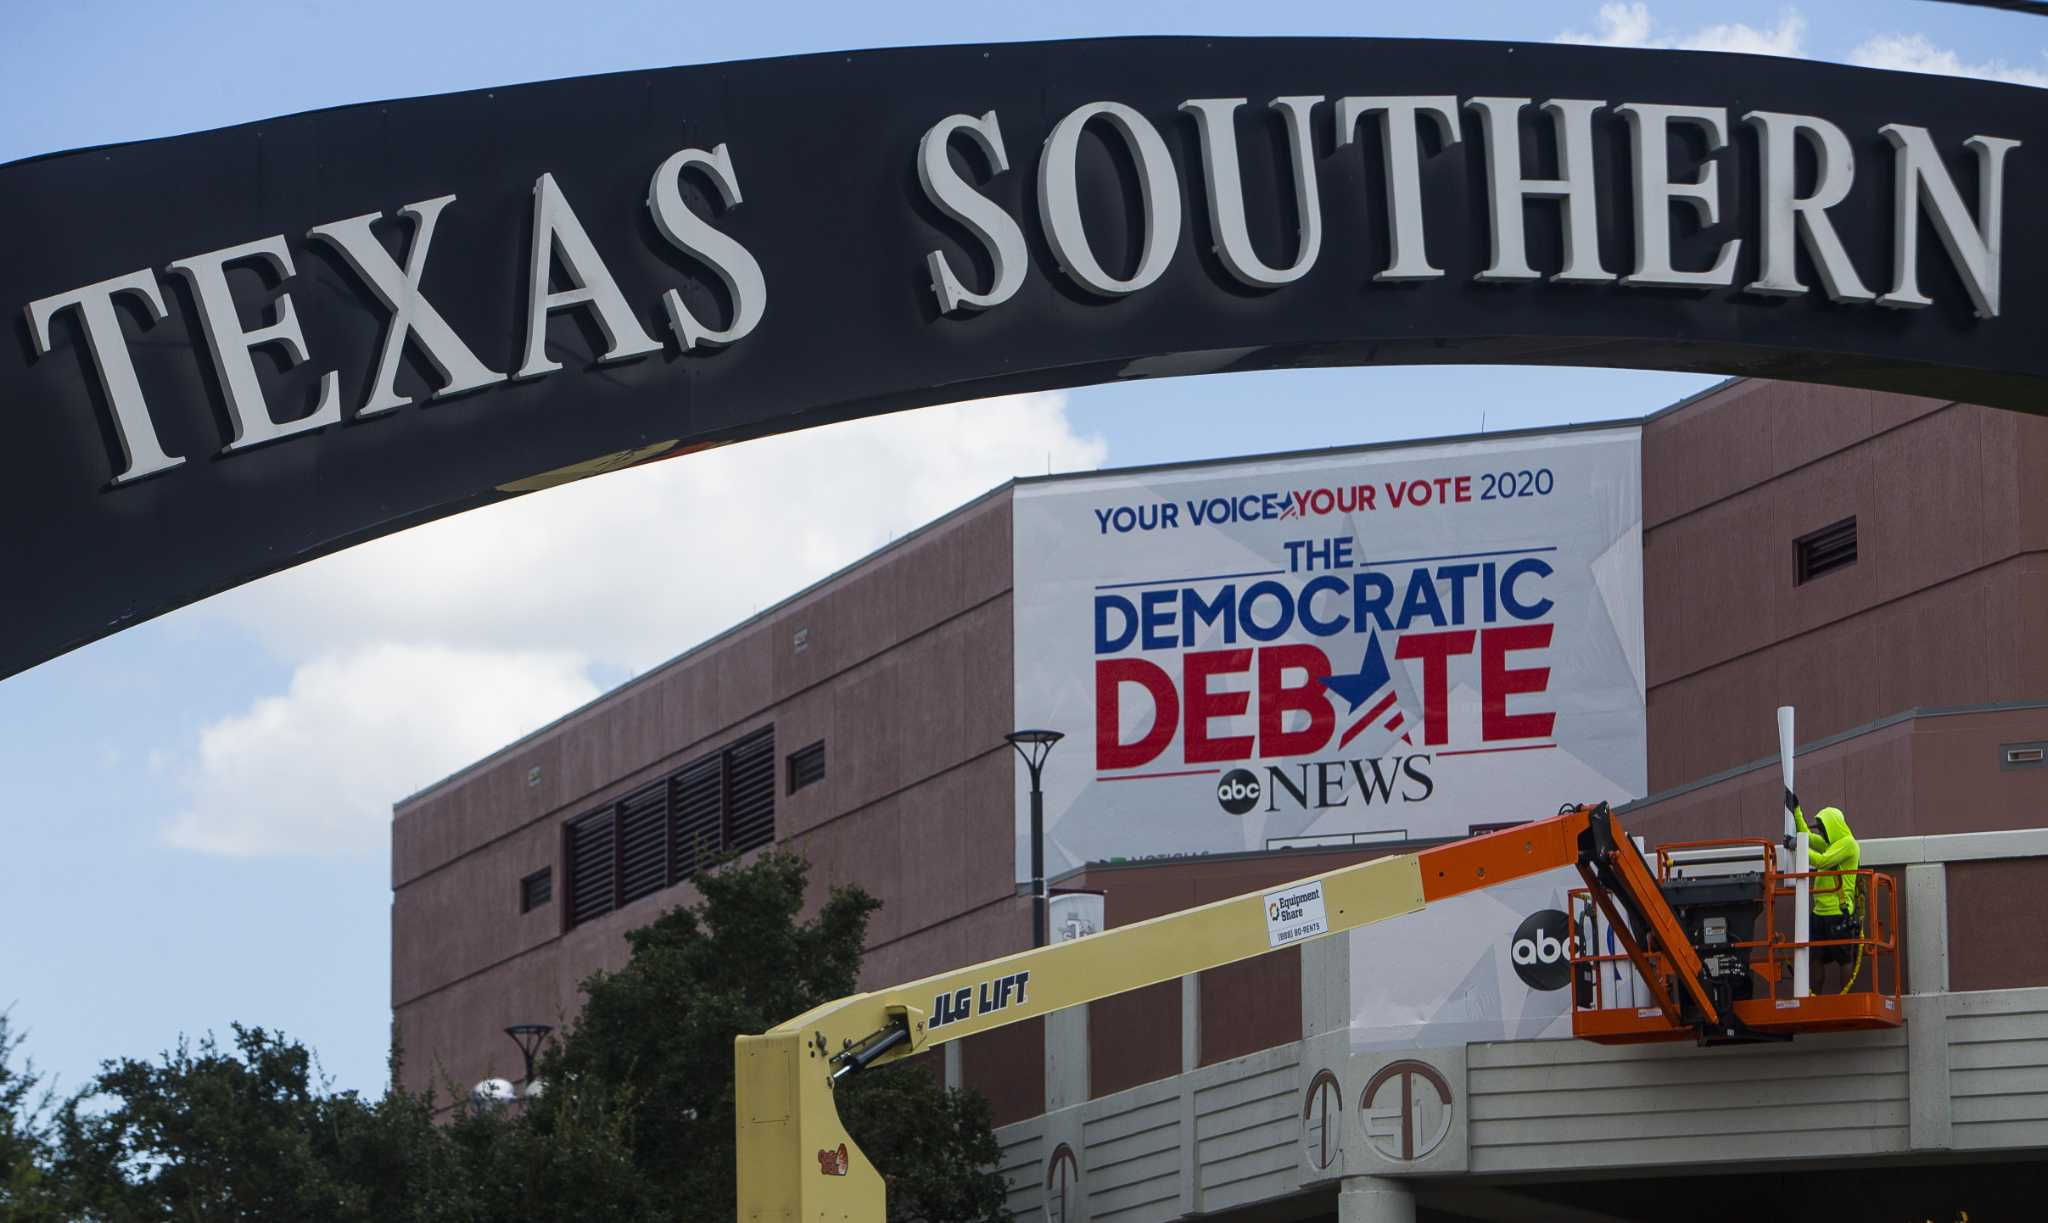 Listen: Historic debate in Houston